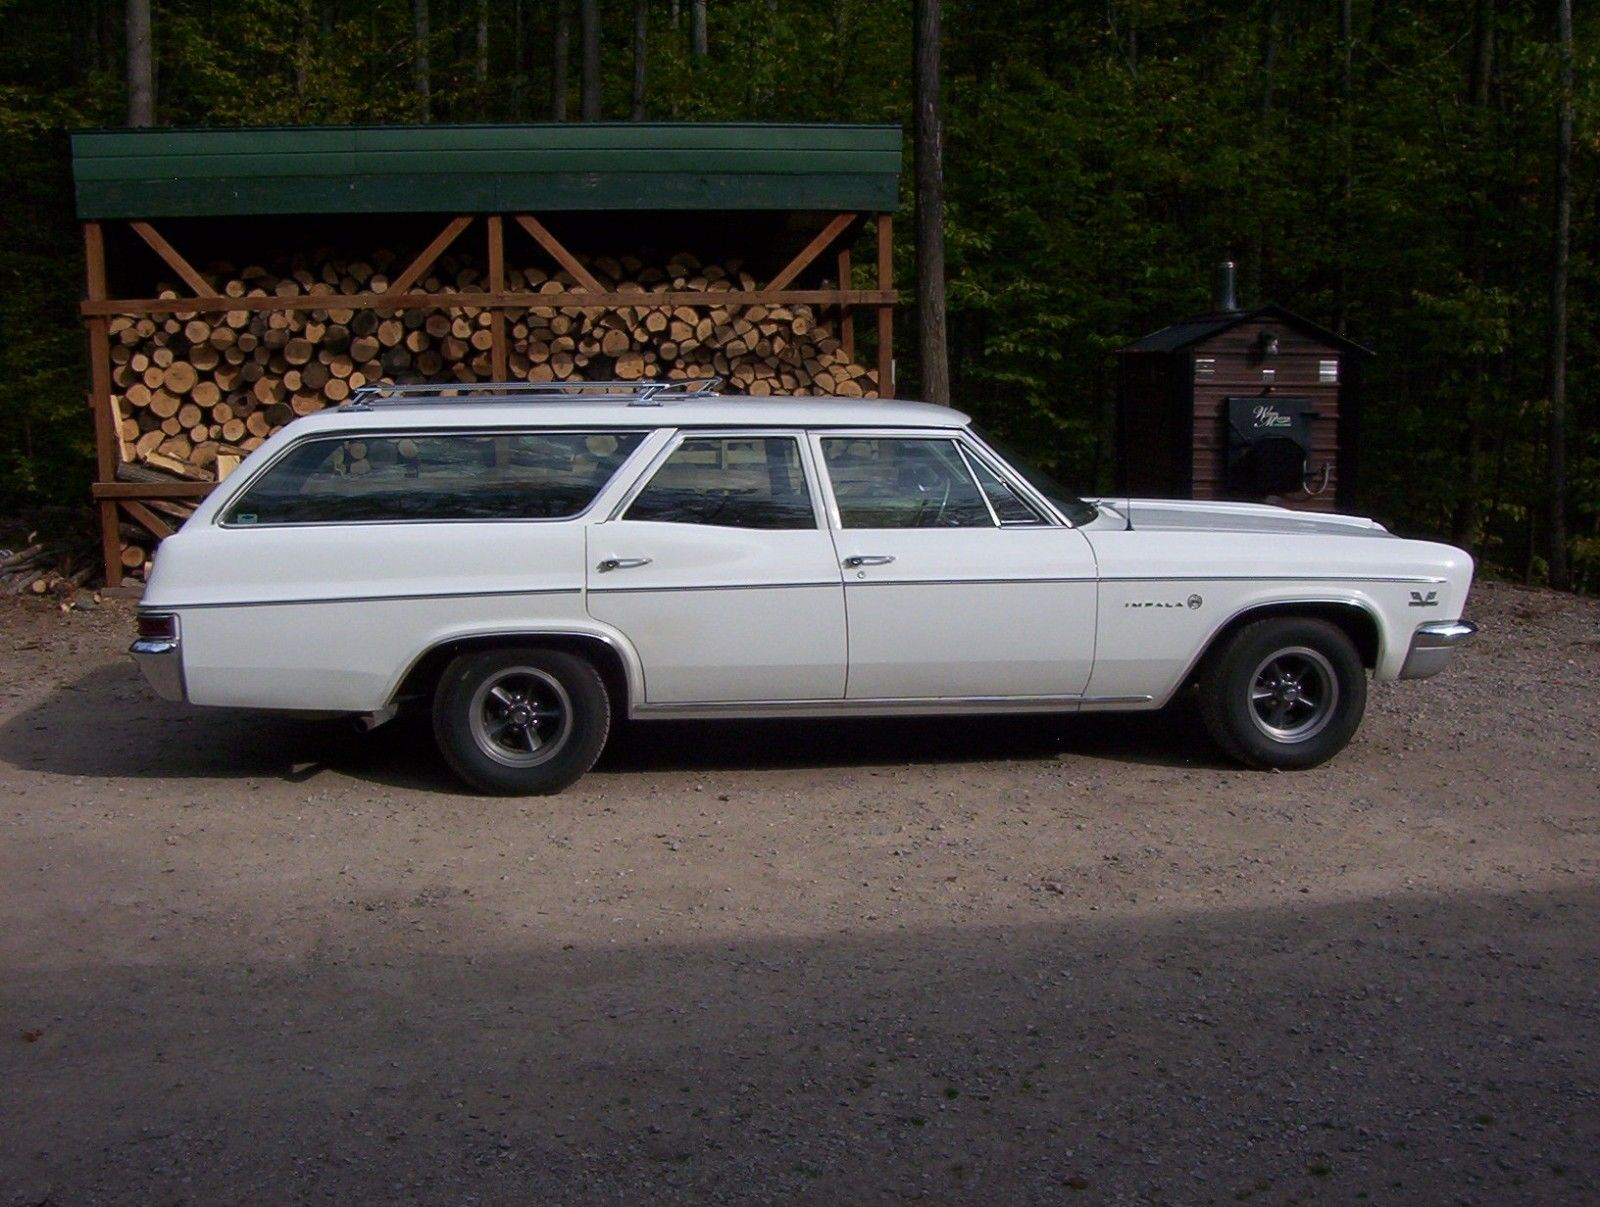 1966-Chevrolet-Impala-Wagon-396-side